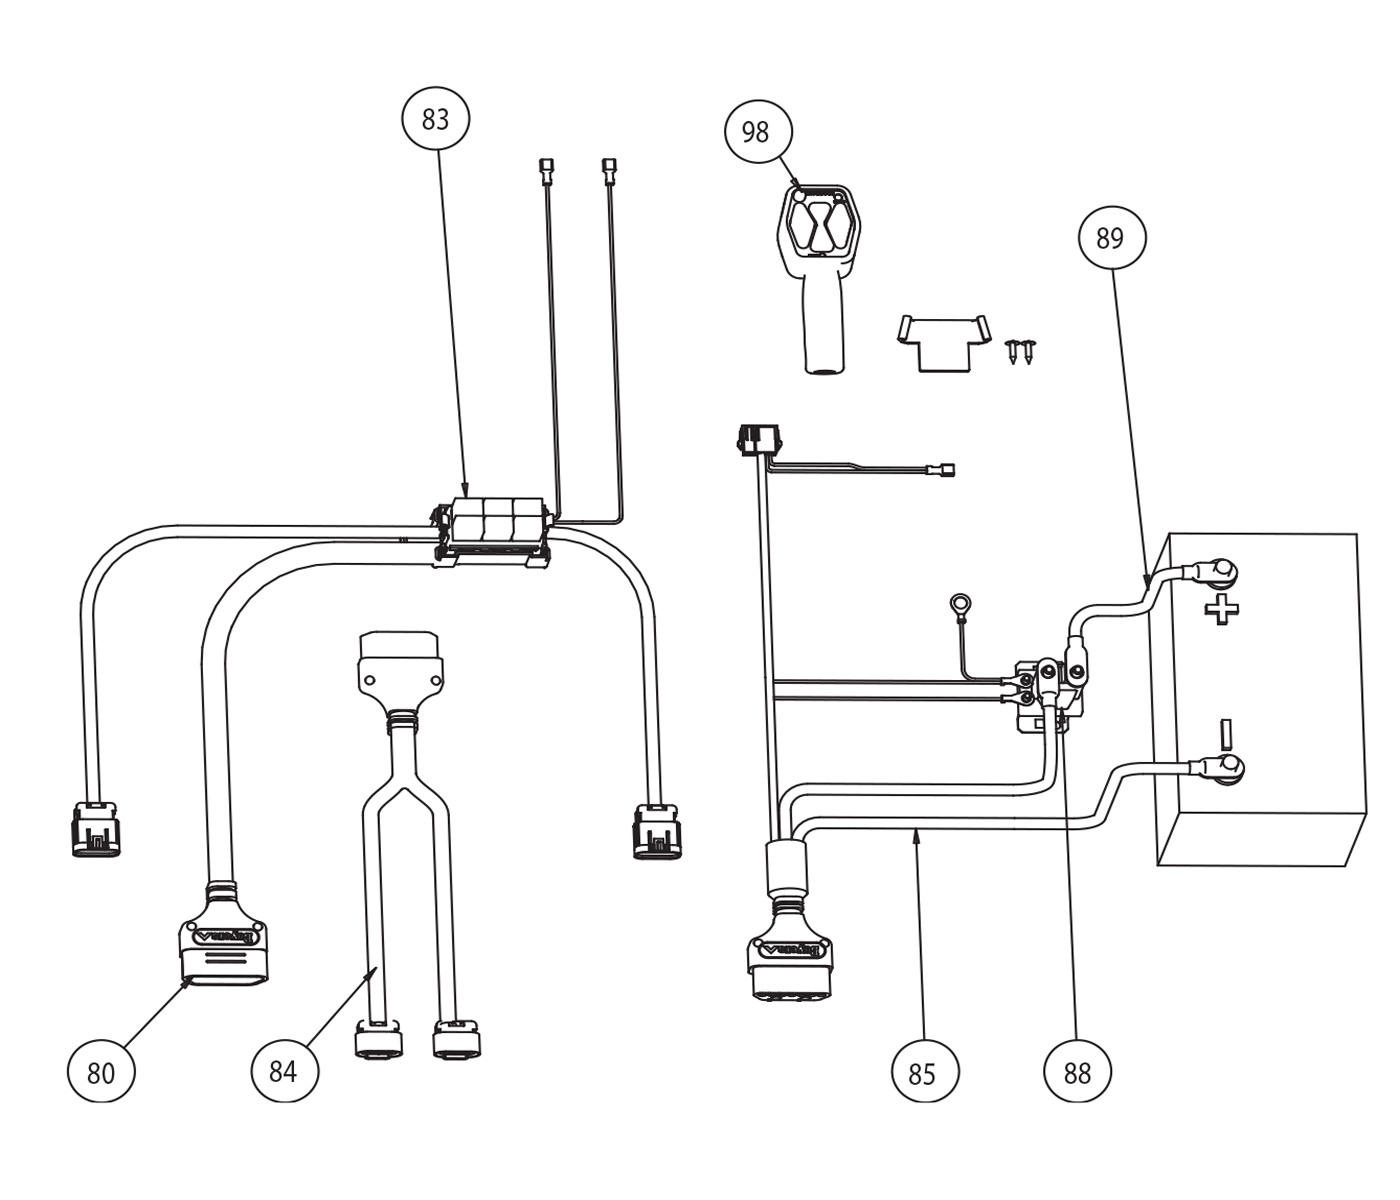 RD_6494] Snow Dog Plow Wiring Diagram Download DiagramWiluq Iness Nekout Hete Pneu Licuk Chim Xeira Attr Barep Favo  Mohammedshrine Librar Wiring 101